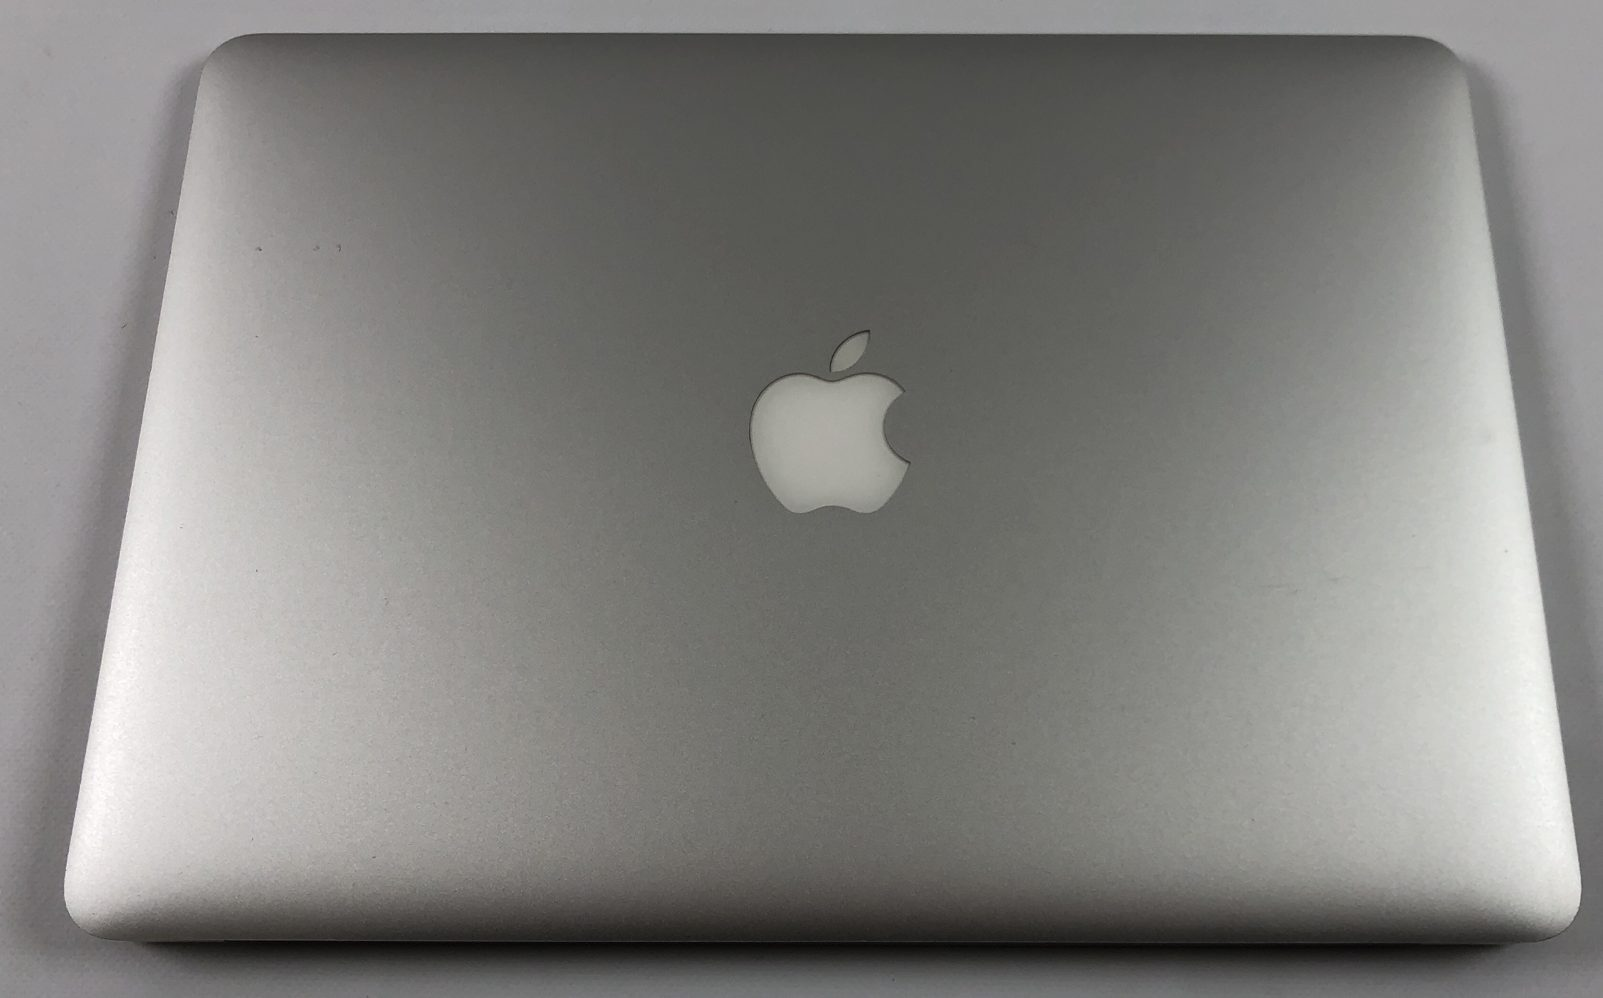 "MacBook Air 13"" Early 2015 (Intel Core i5 1.6 GHz 8 GB RAM 128 GB SSD), Intel Core i5 1.6 GHz, 8 GB RAM, 128 GB SSD, Kuva 2"